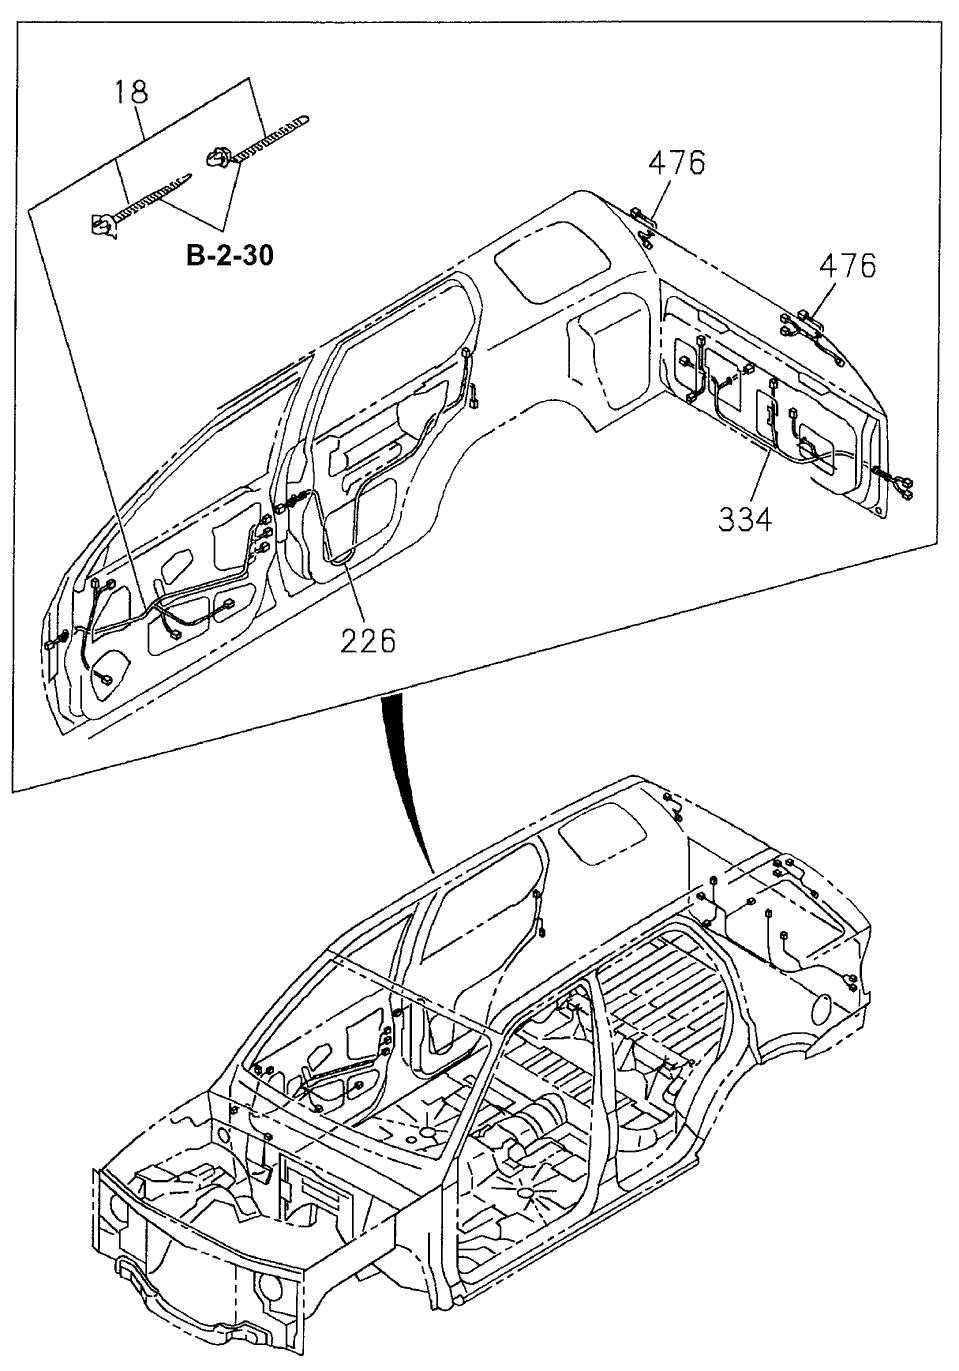 1998 Honda Passport Fuel Pump Wiring Diagram